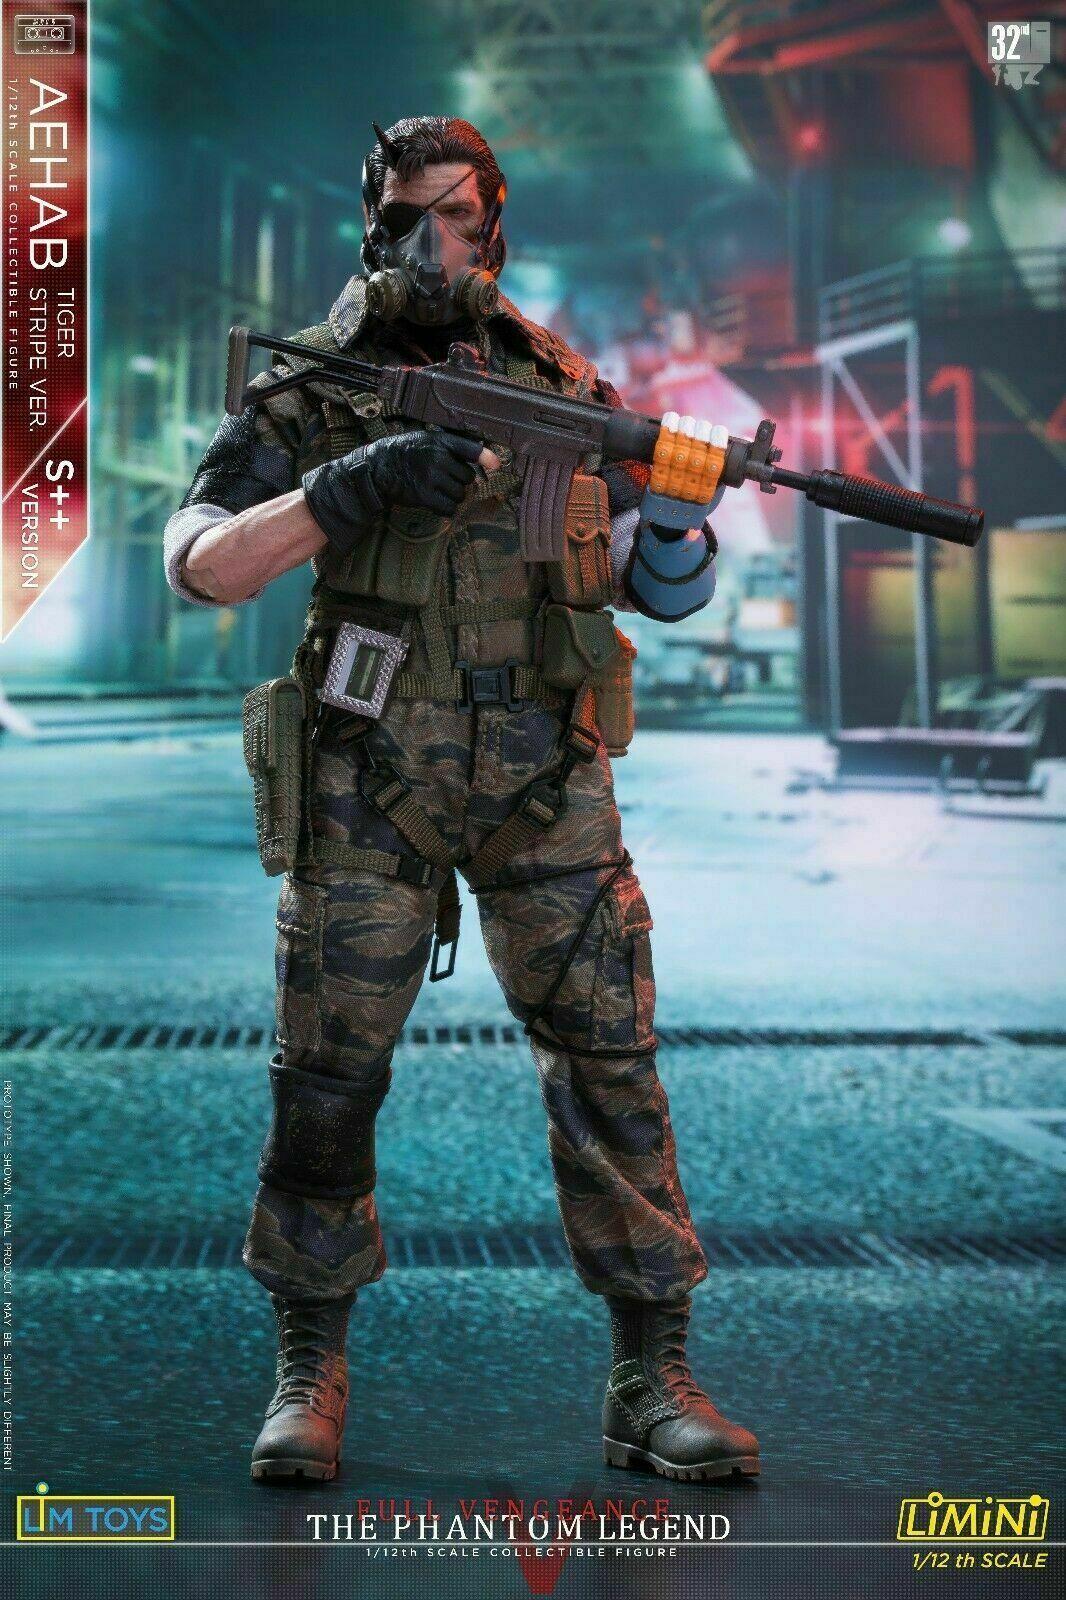 LIMTOYS LIMINI aehab 1 12 escala 6  Solid Snake Ismael S + + Ver Figura De Cuerpo Masculino